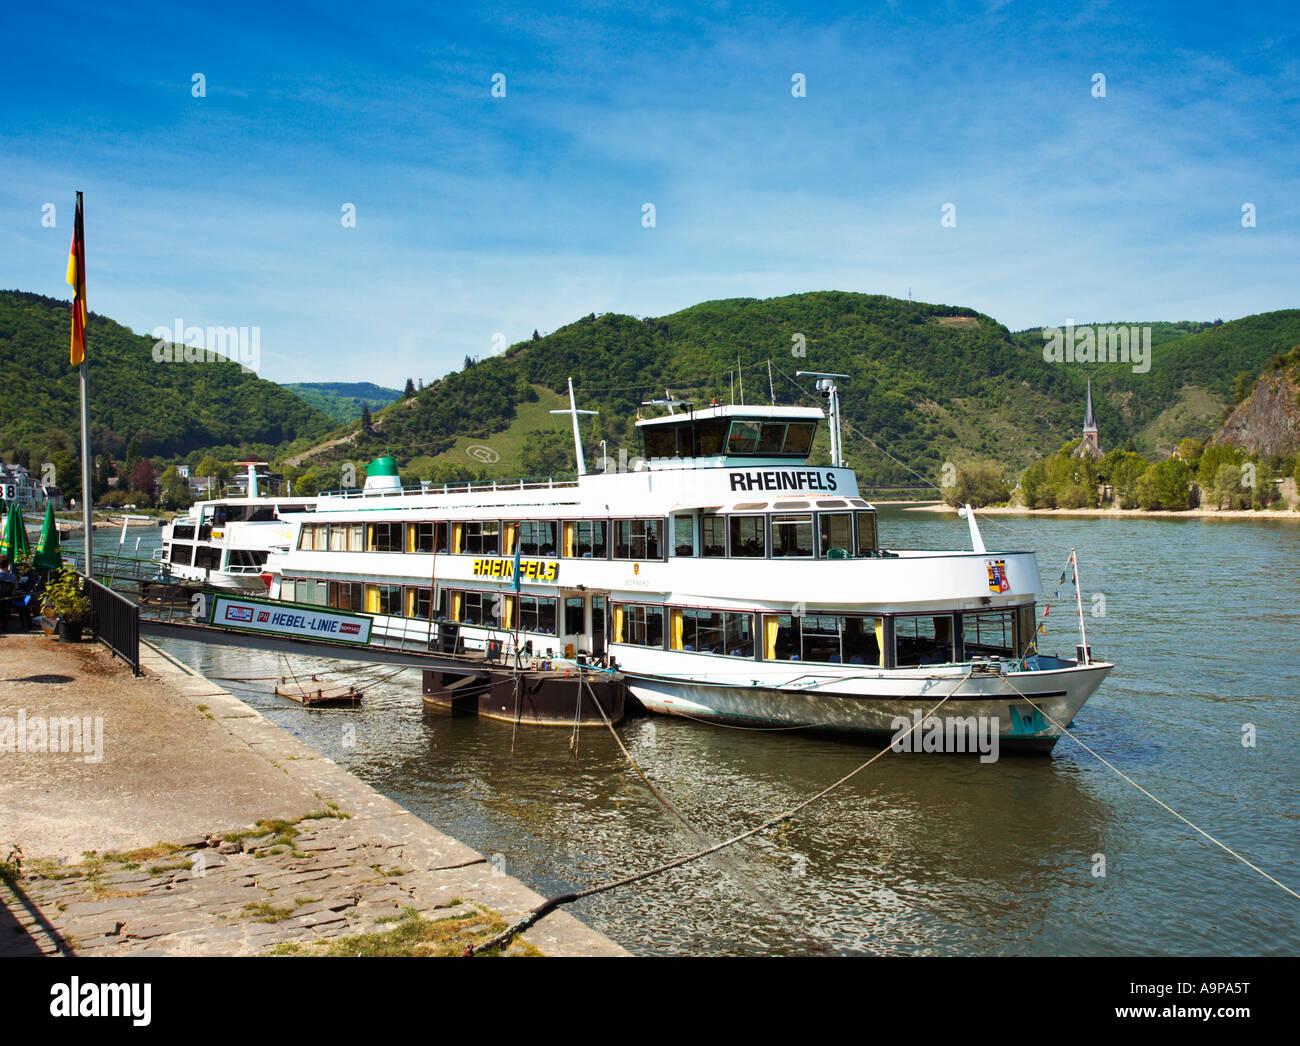 Germany - Rhine river cruise boat docked at the river front in Boppard on the River Rhine Germany Europe - Stock Image